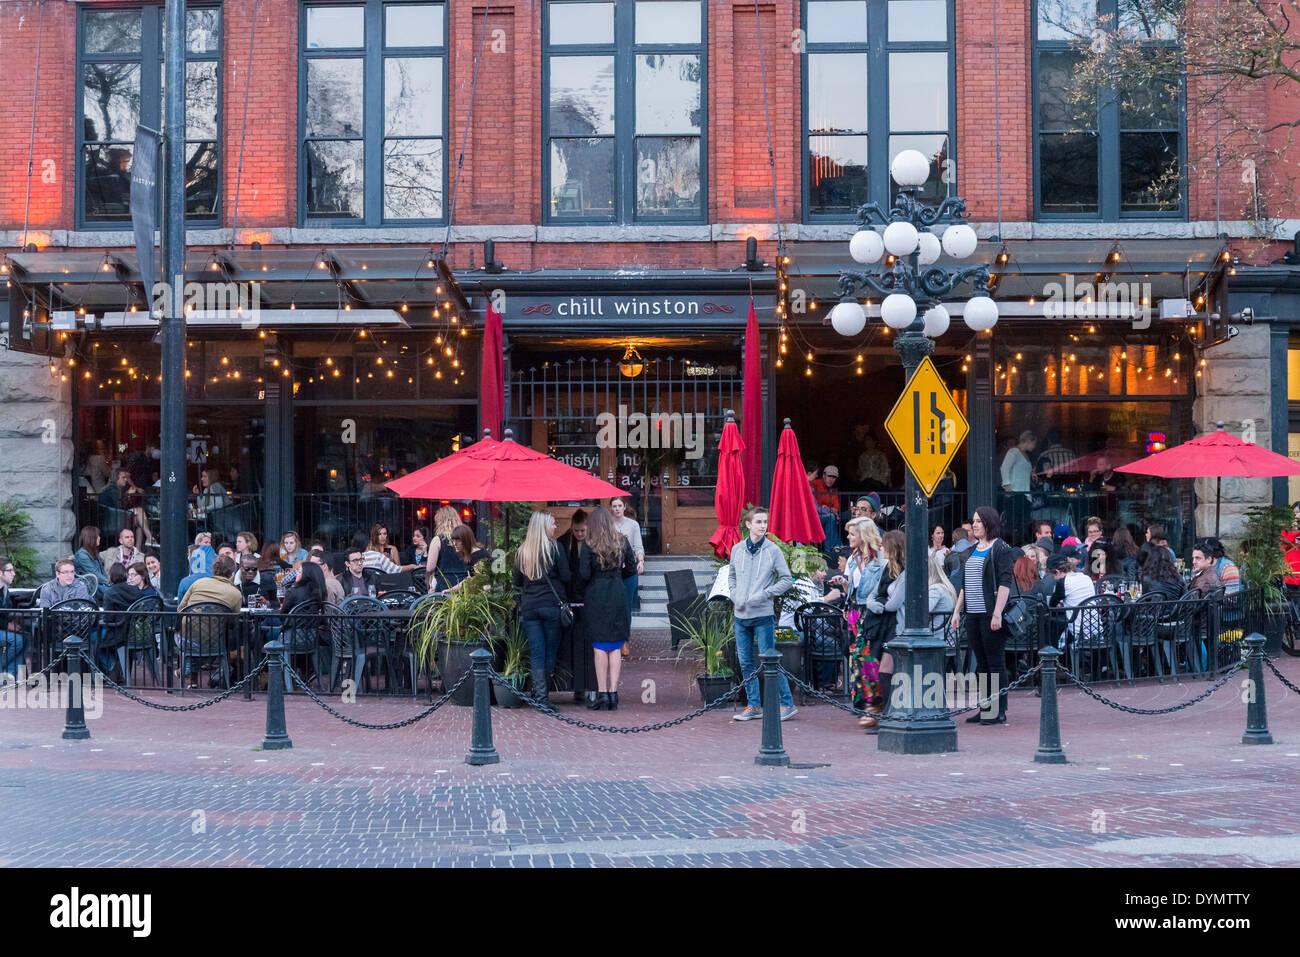 Chill Winston, Outdoor Patio, Gastown, Vancouver, British Columbia, Canada